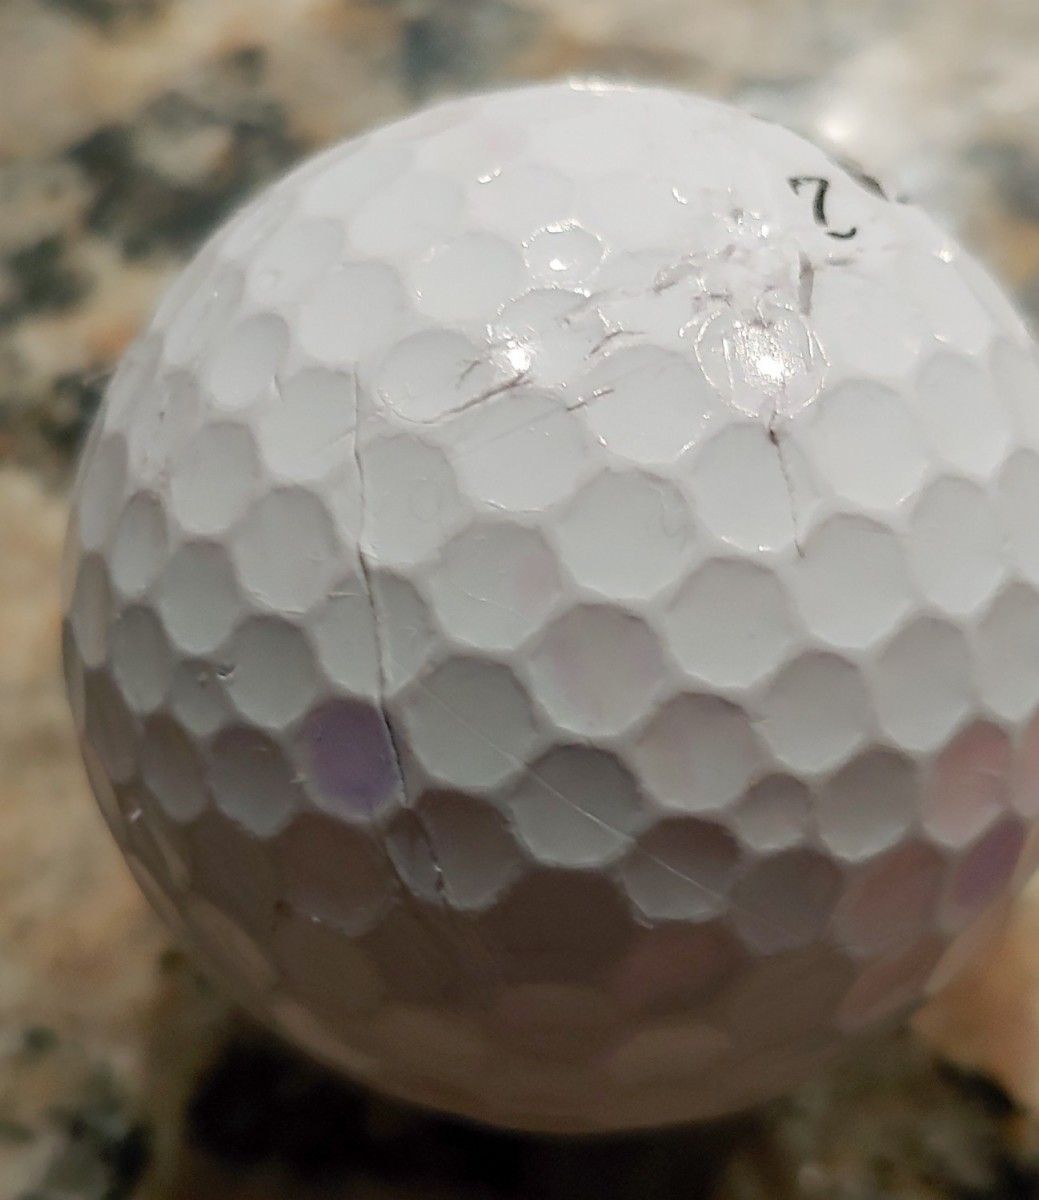 2075015642_wreckedball.thumb.jpg.b6870b7a2861a1541cfe2fba6de0d5ca.jpg